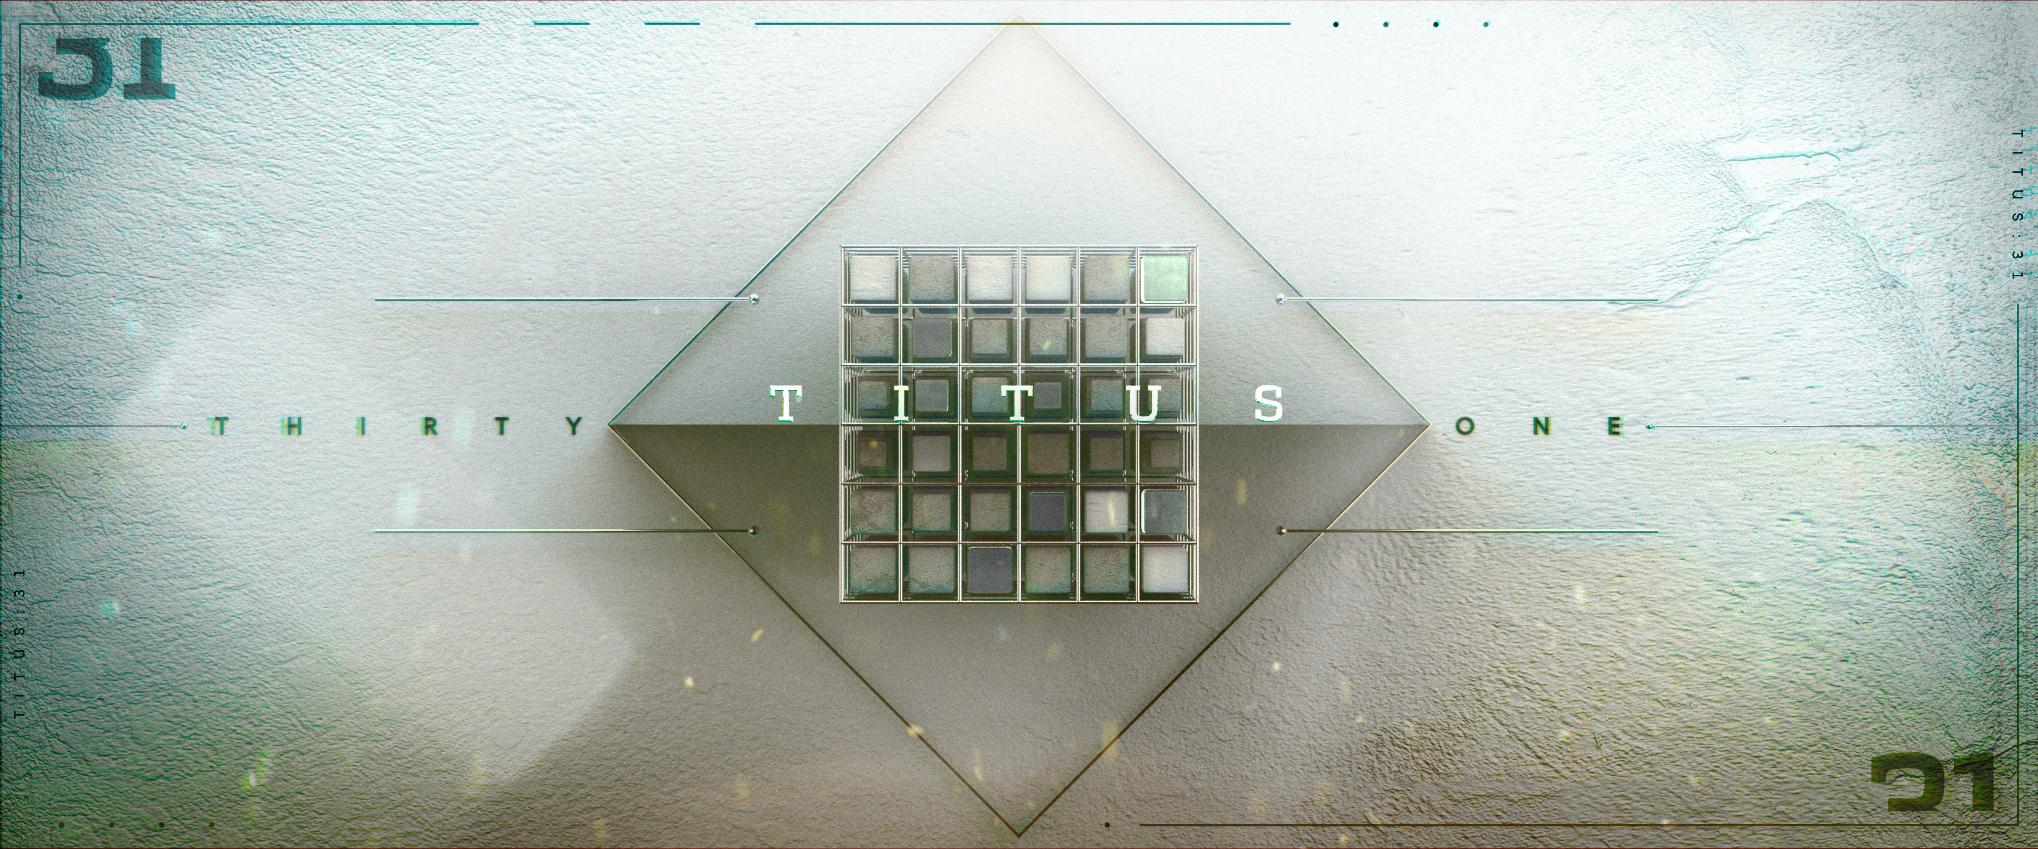 TITUS 31 Frame_05